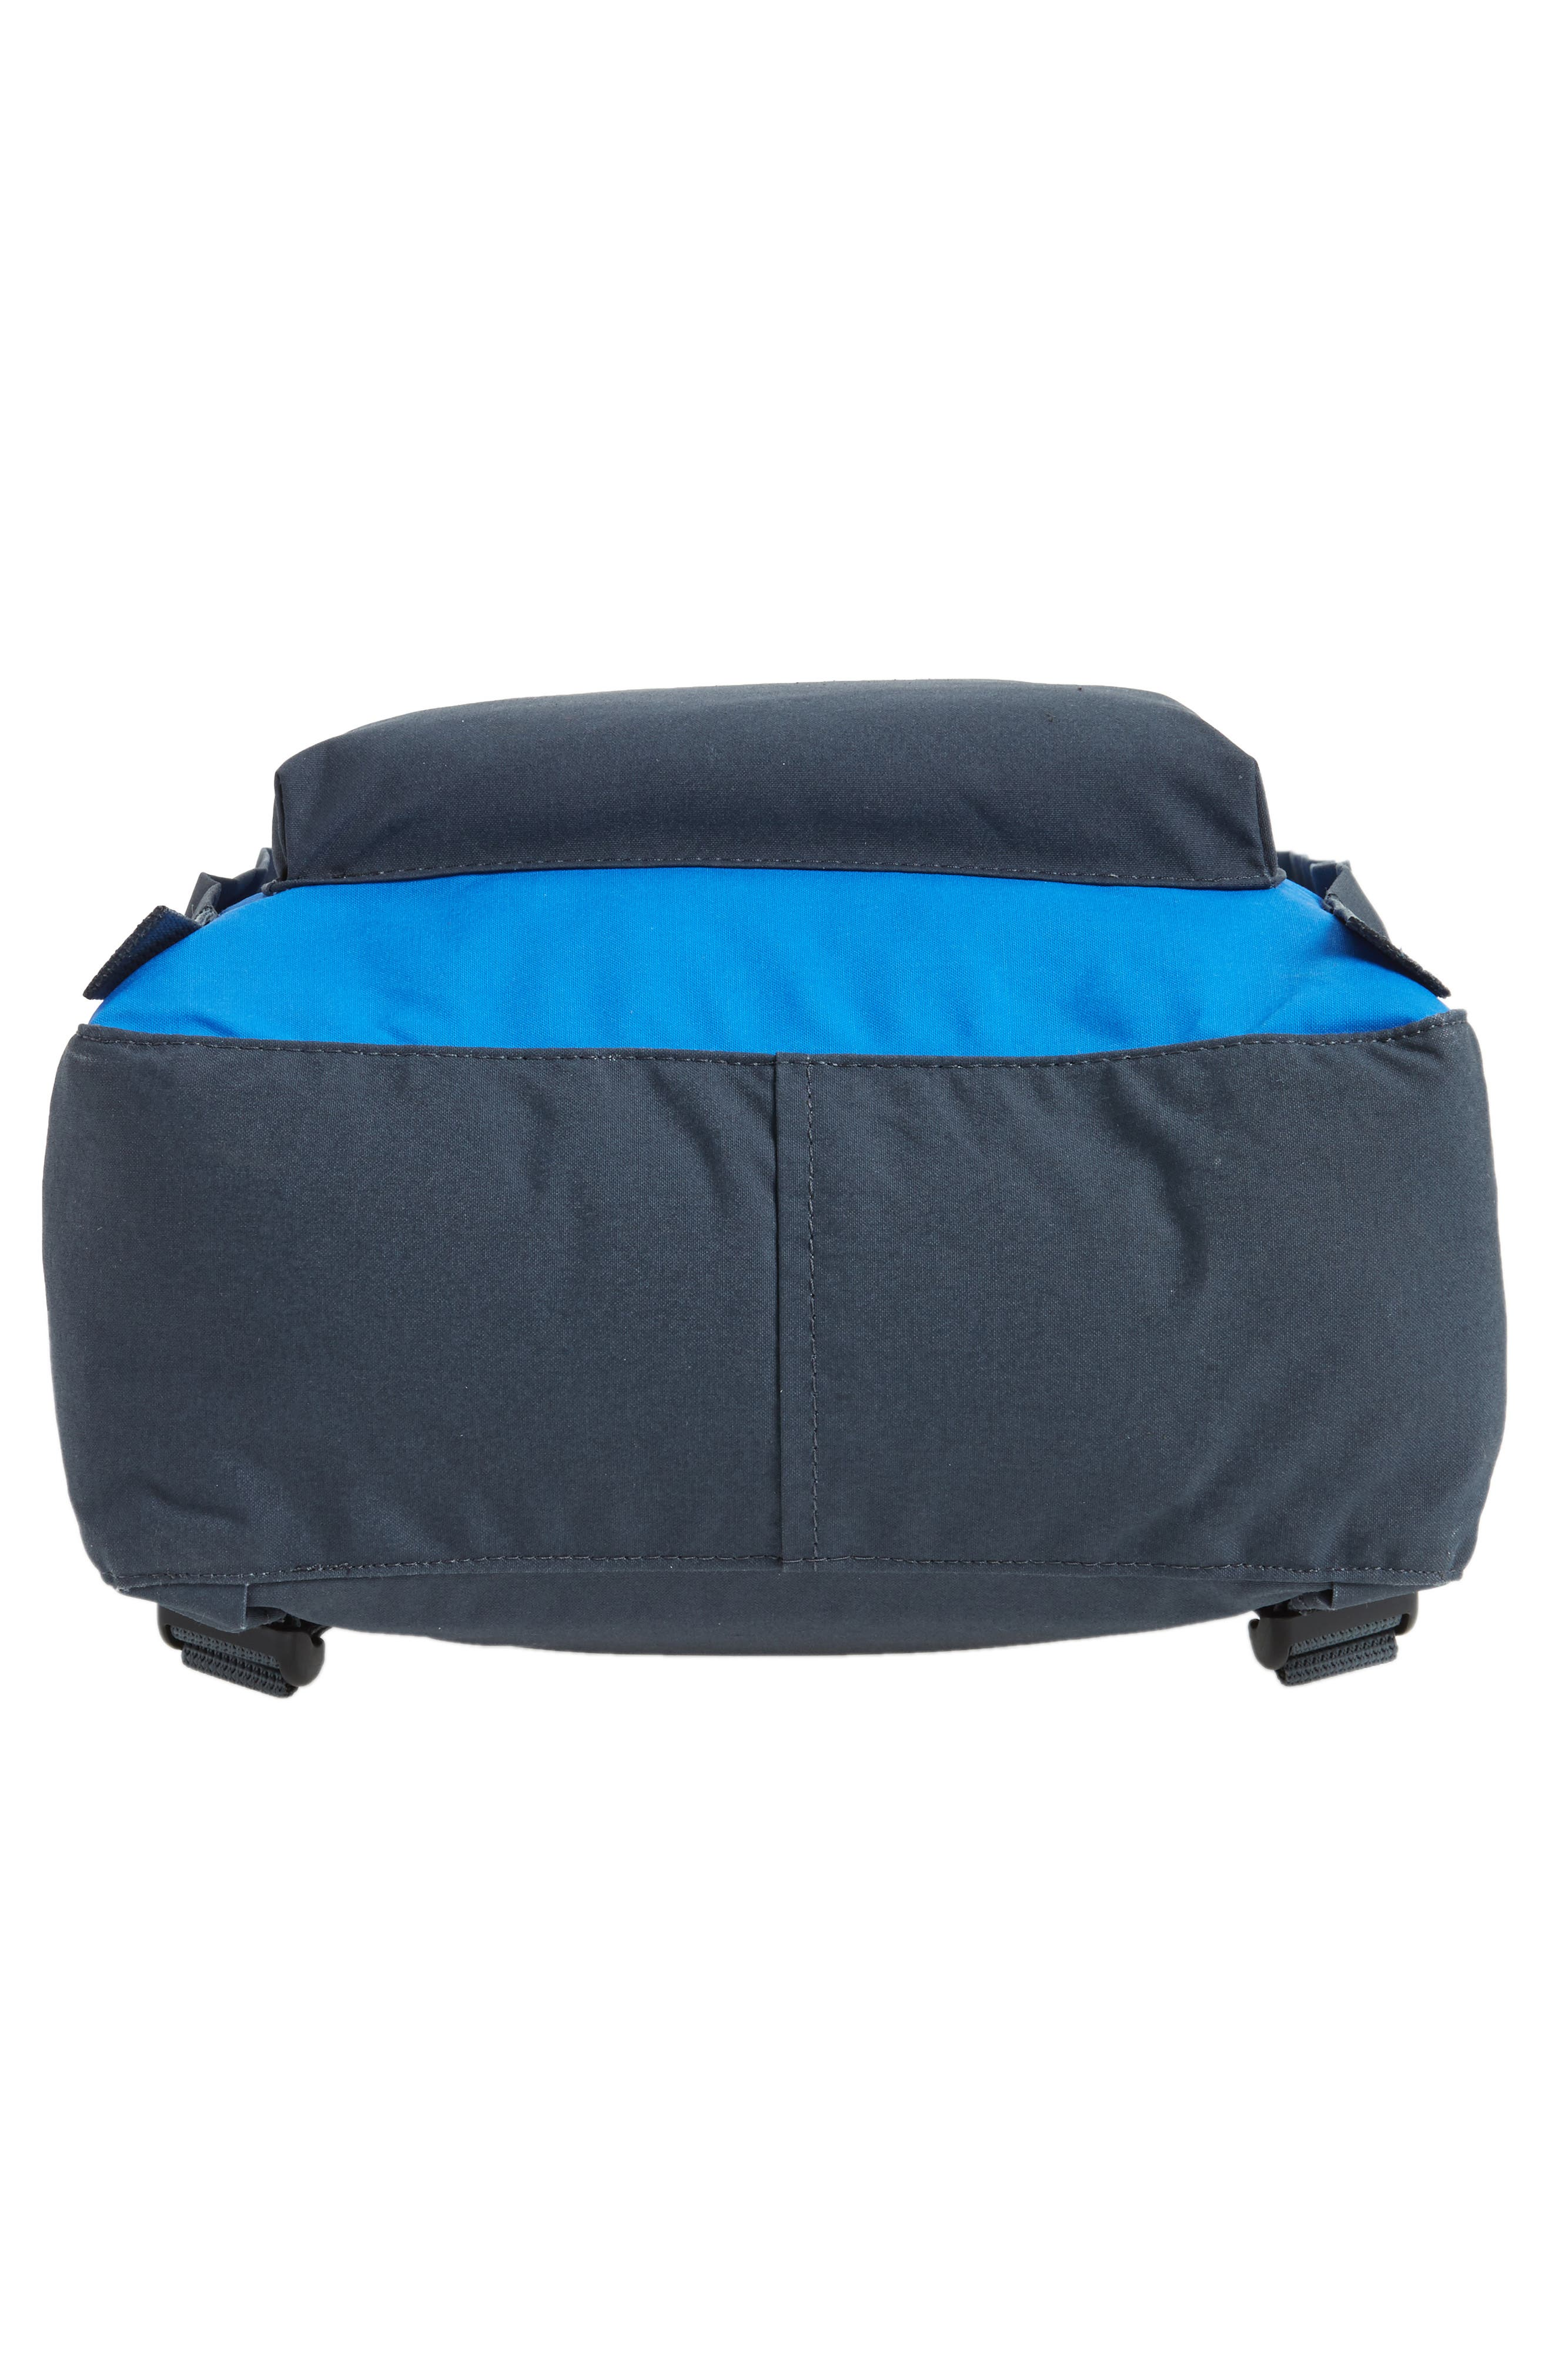 'Kånken' Water Resistant Backpack,                             Alternate thumbnail 323, color,